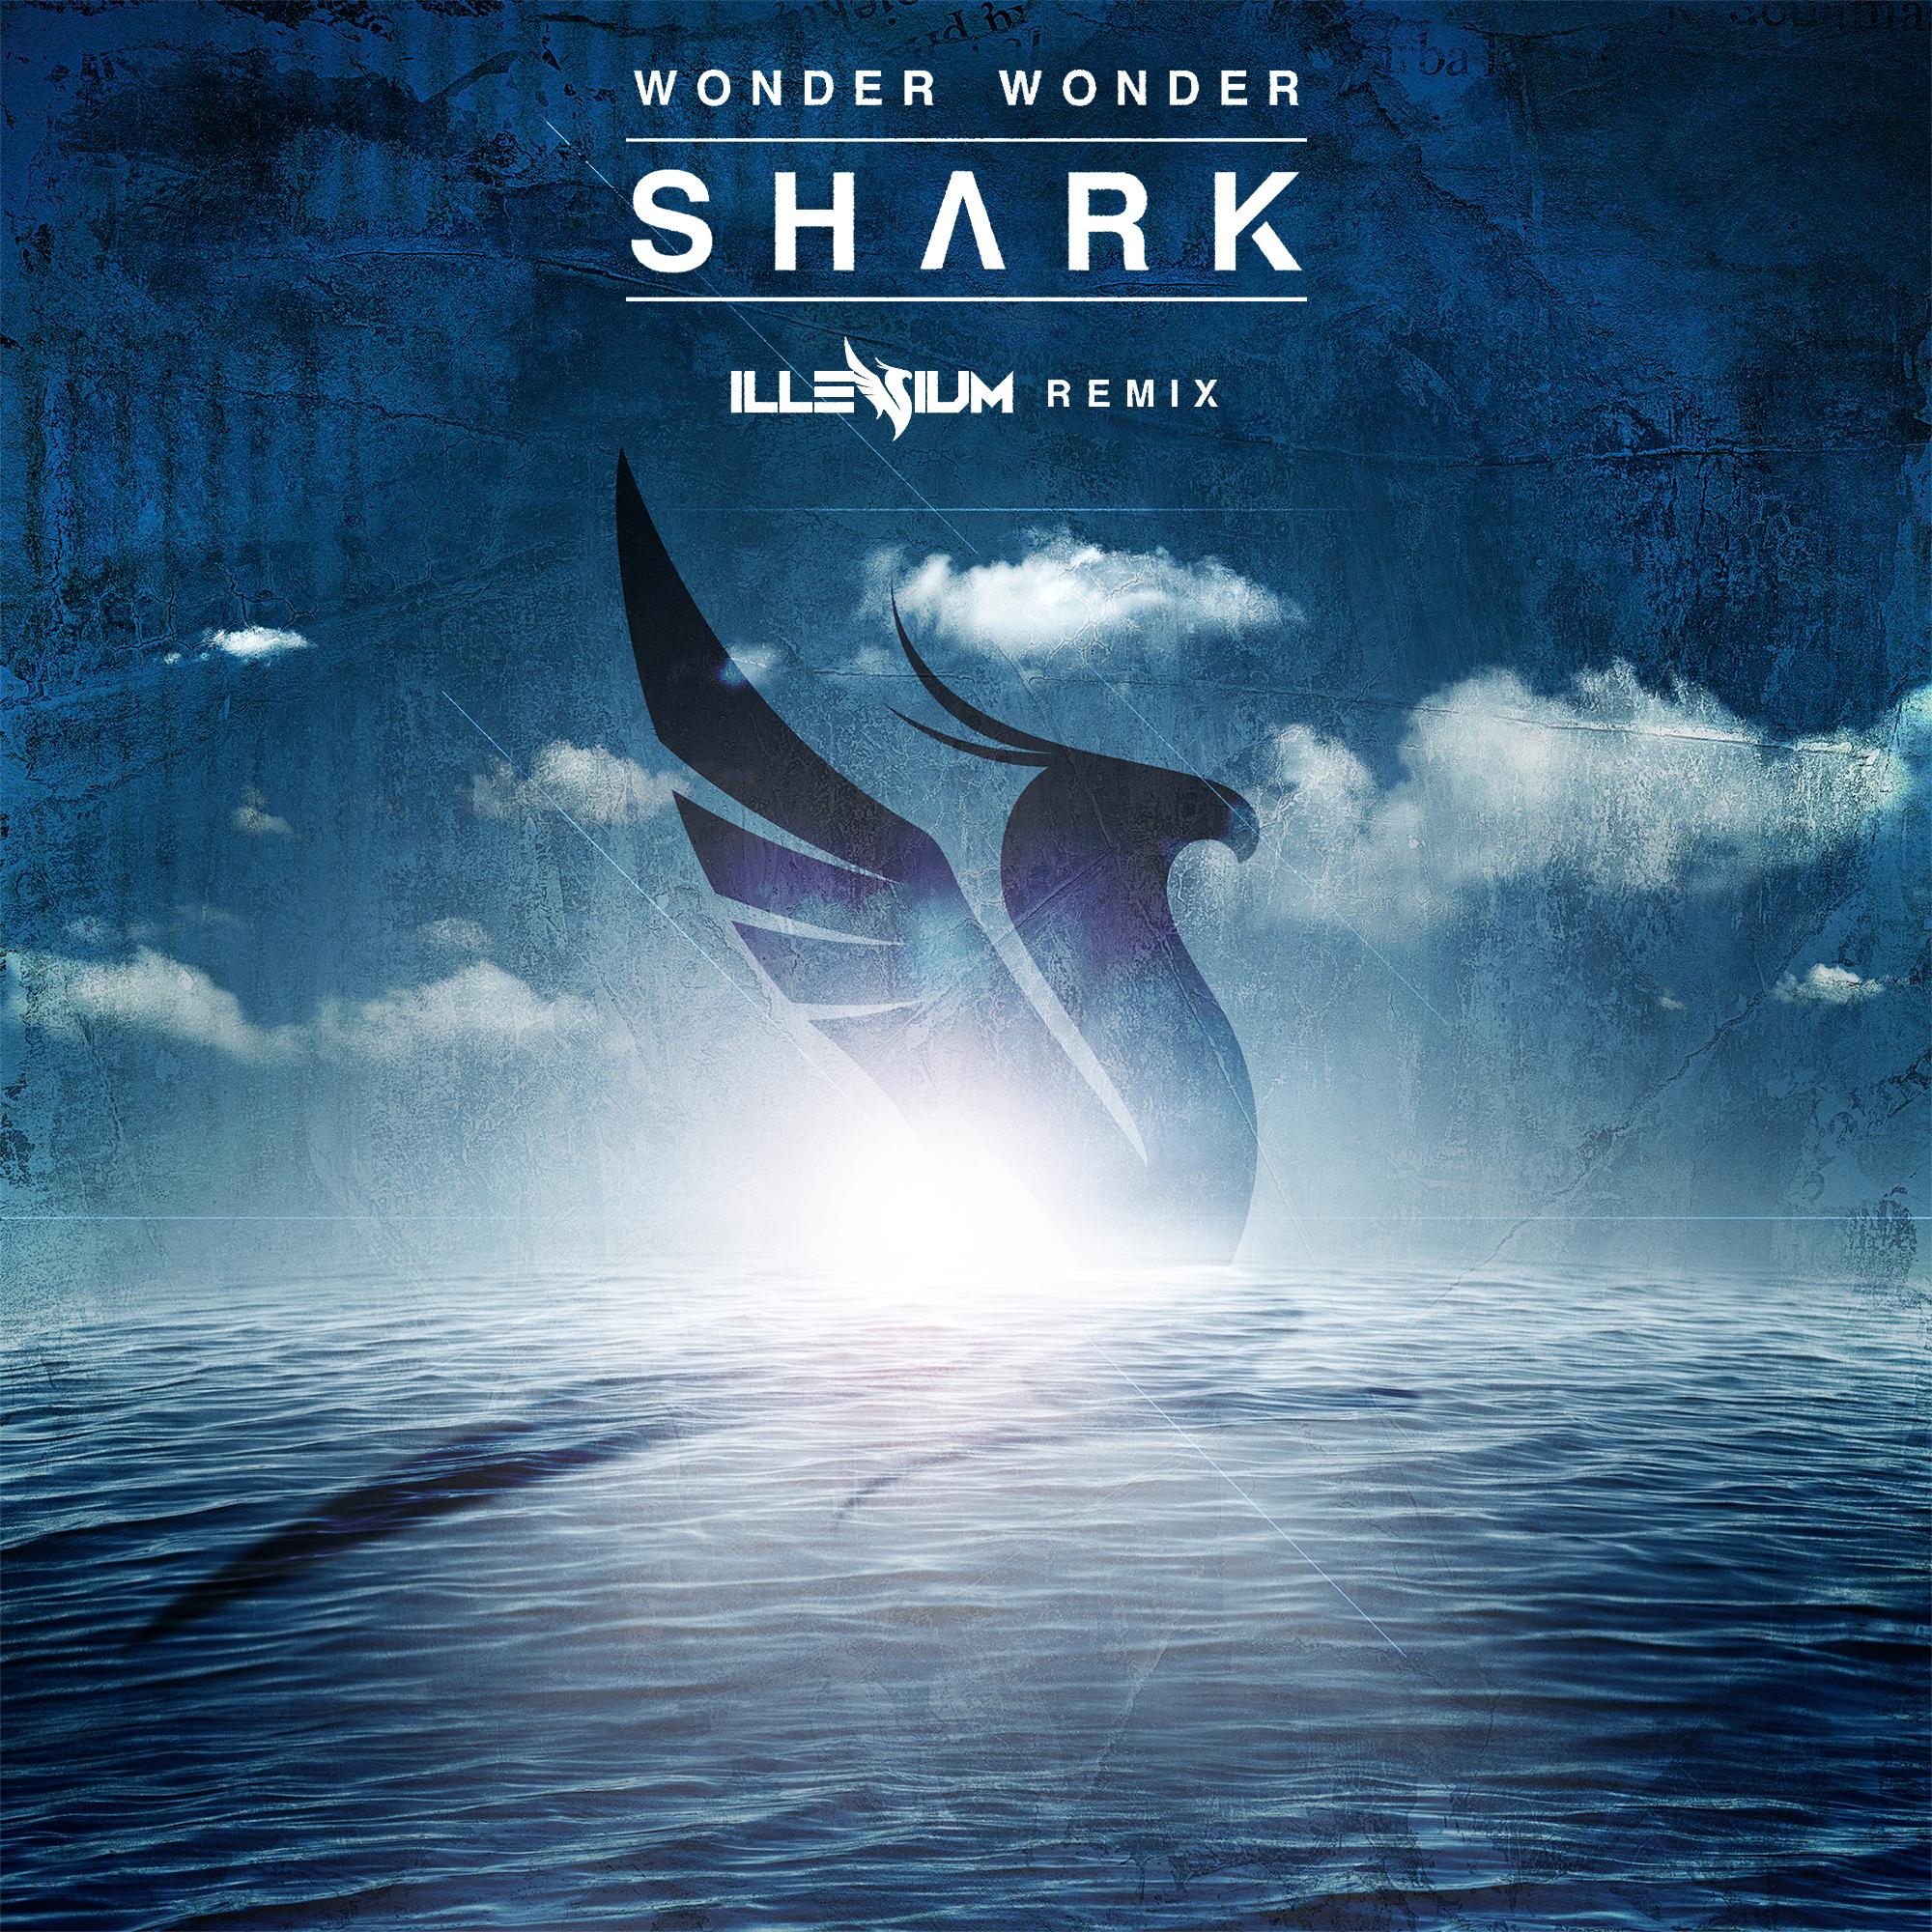 Progressive Near Me >> Wonder Wonder - Shark (Illenium Remix) [FREE DOWNLOAD]